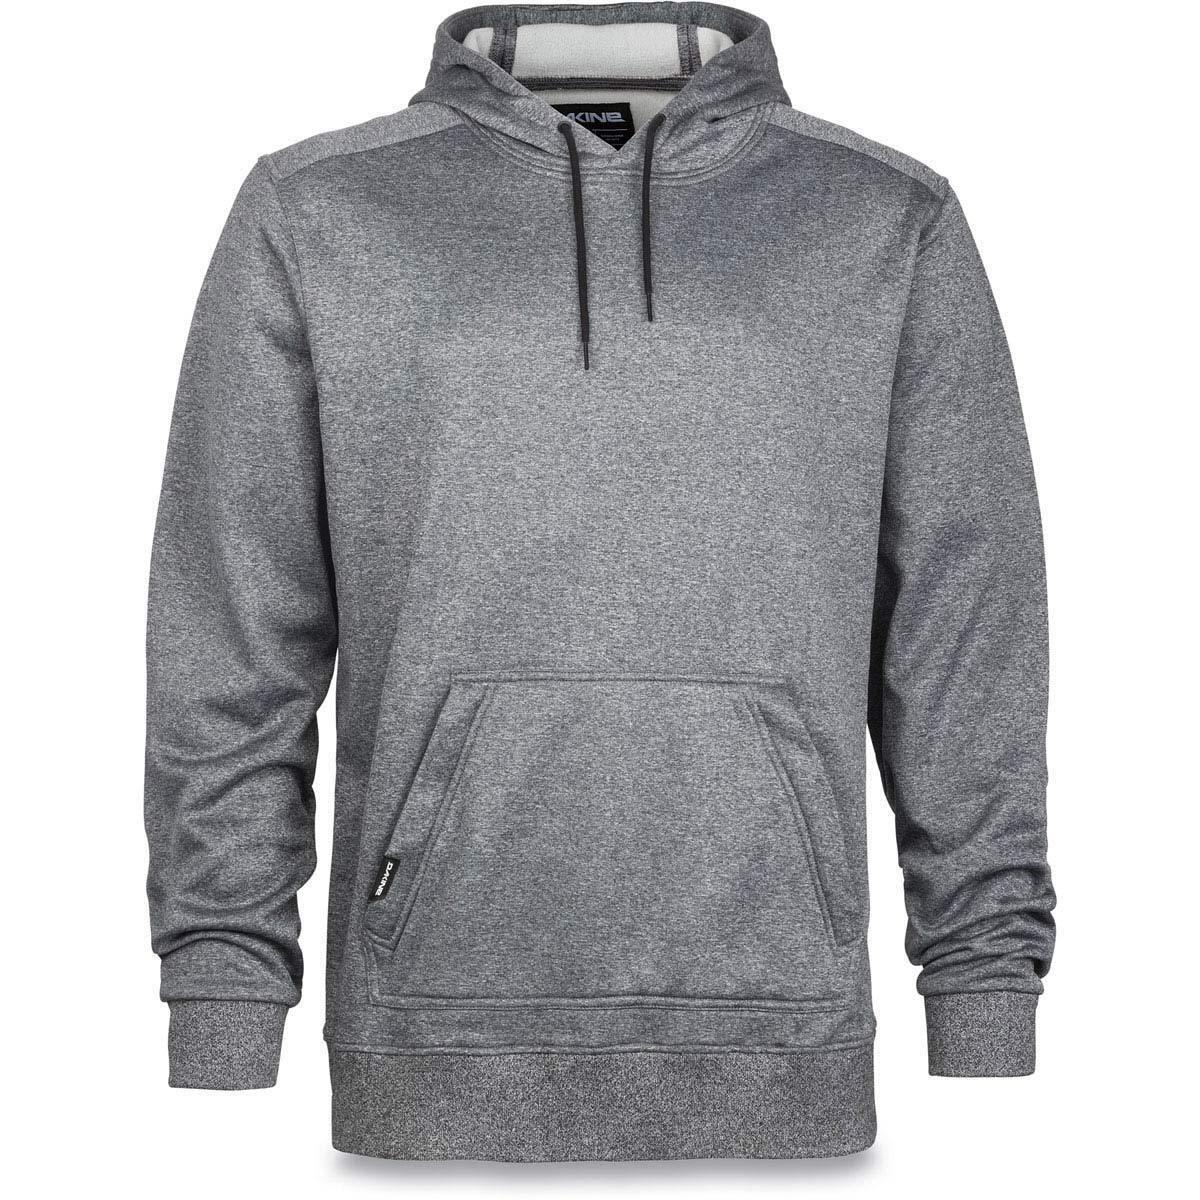 2017 NWT DAKINE  Herren IRONSIDE TECH HOODIE XL 95 heatherGrau adjustable hood